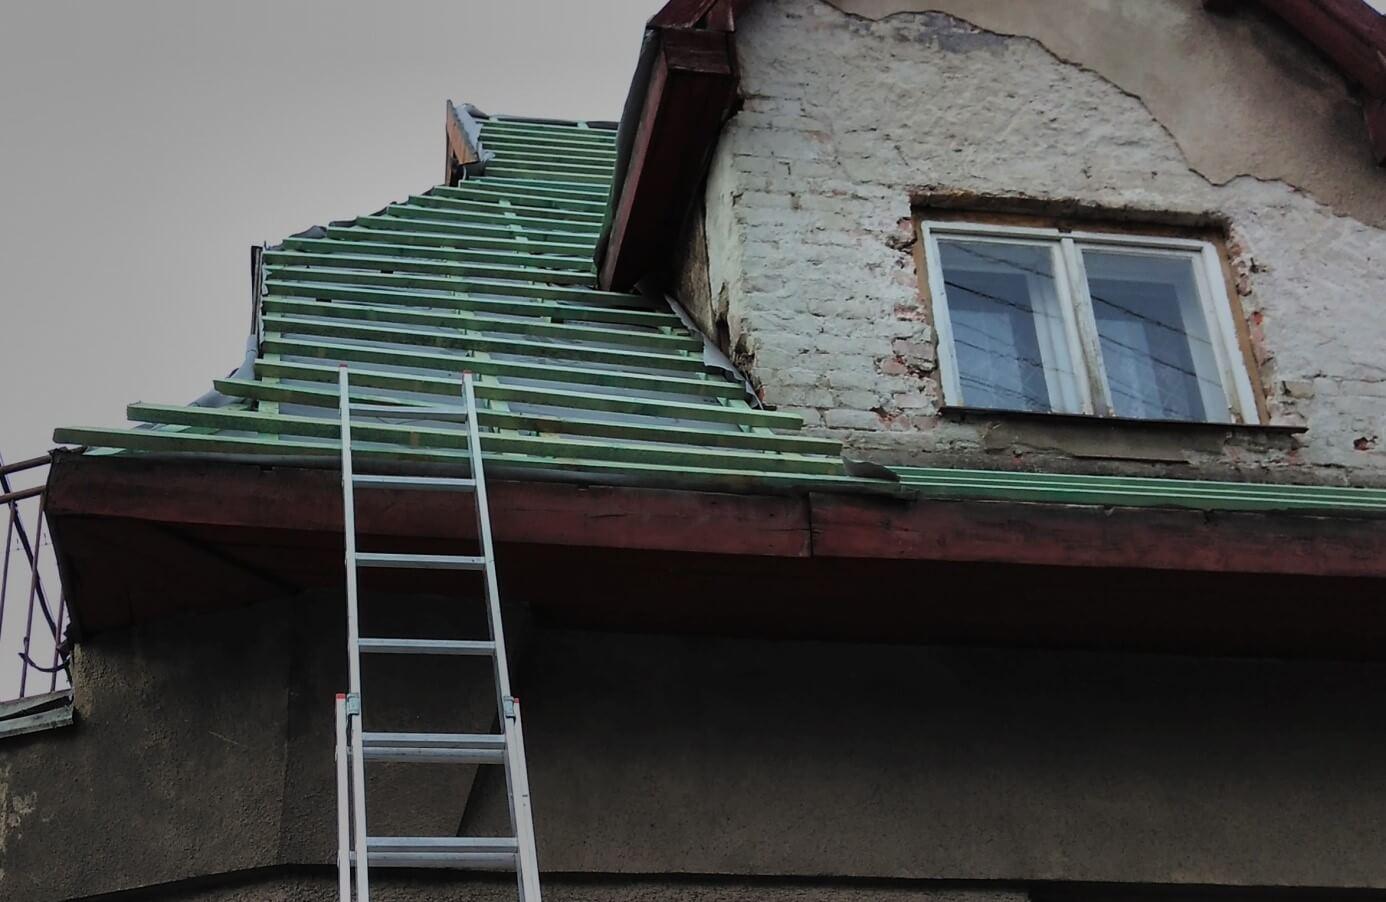 Krive-latovanie-strechy-strecha-rebrik-stay-dom